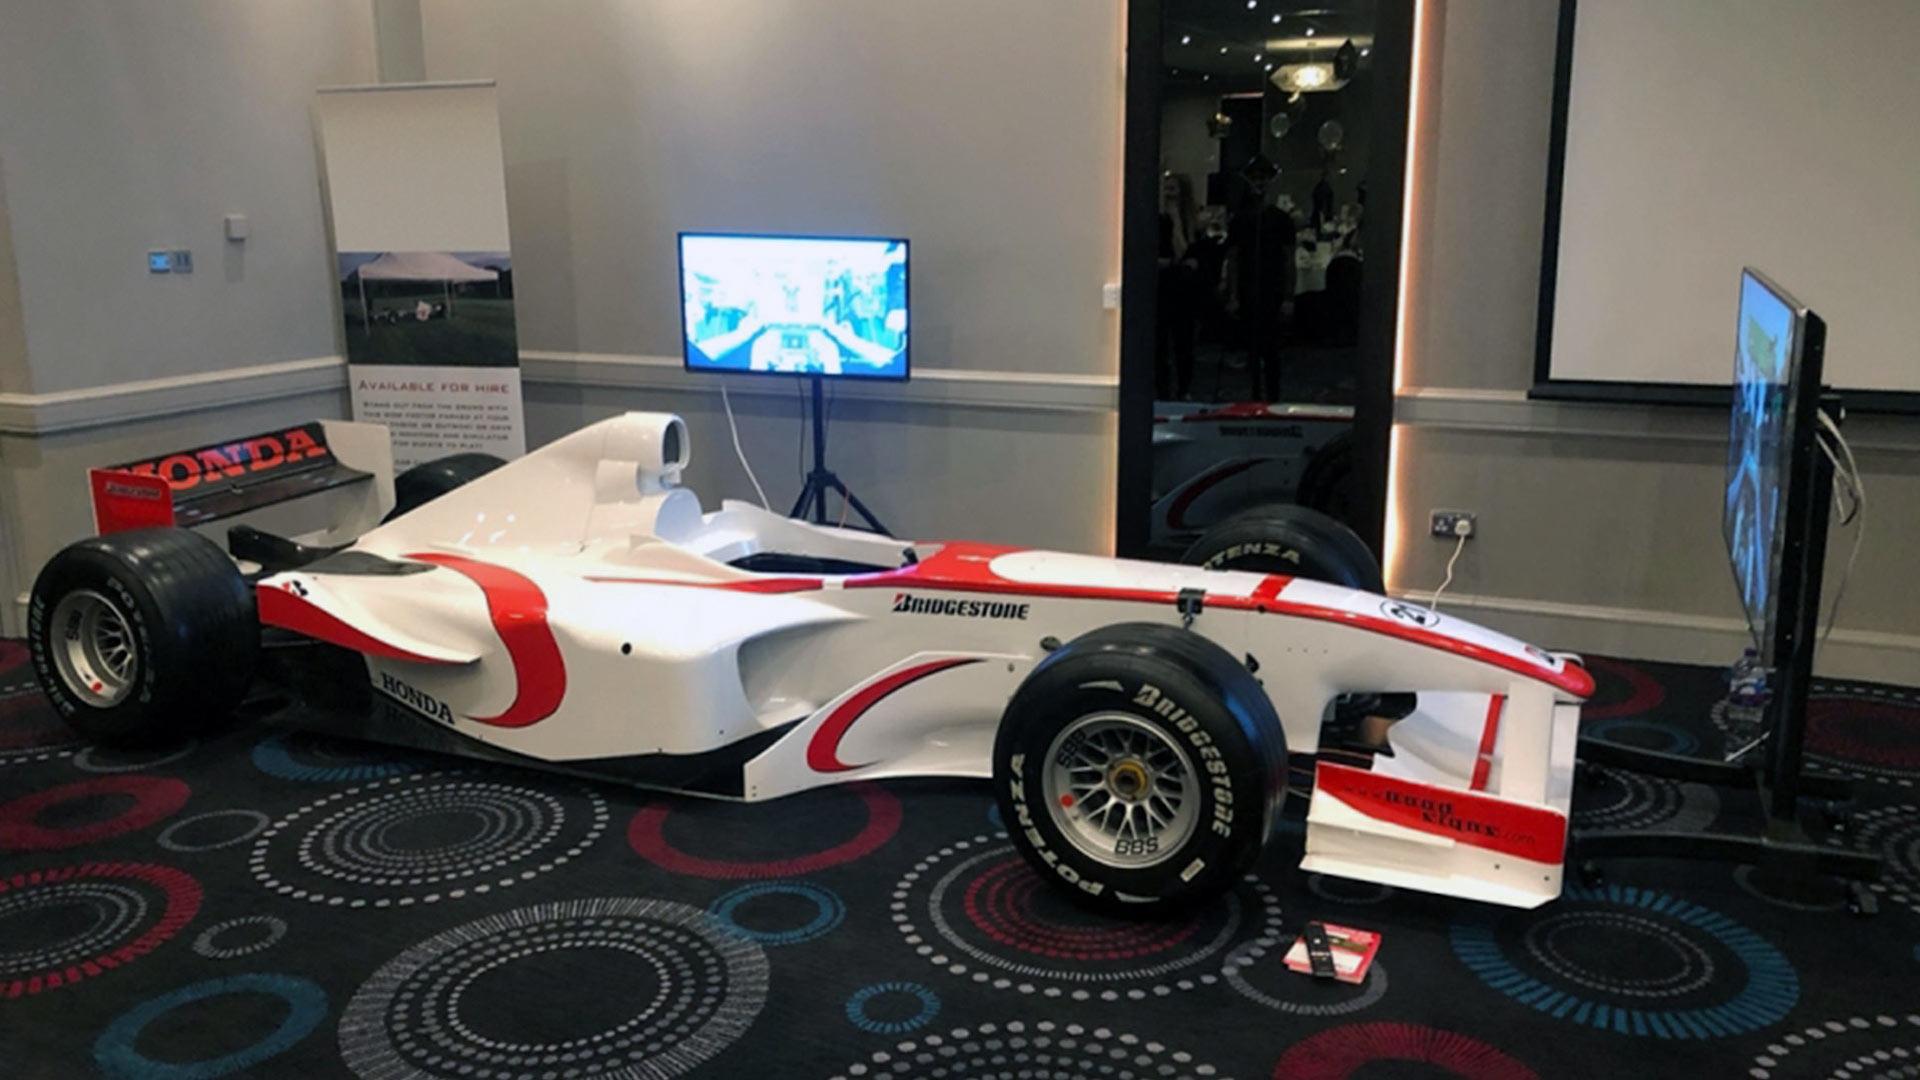 Race Retro Super Aguri F1 Simulator